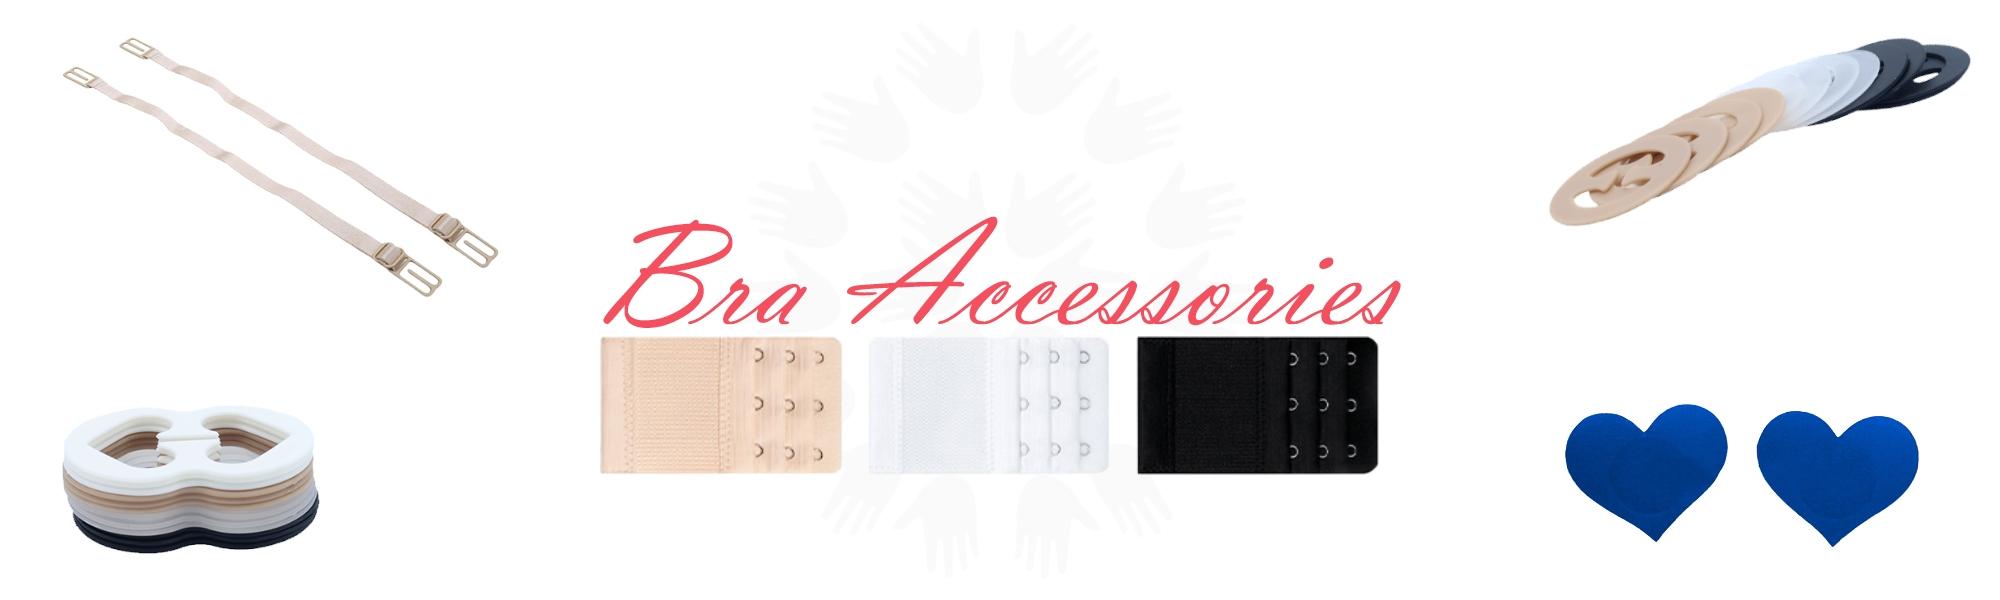 Shop Bra Accessories